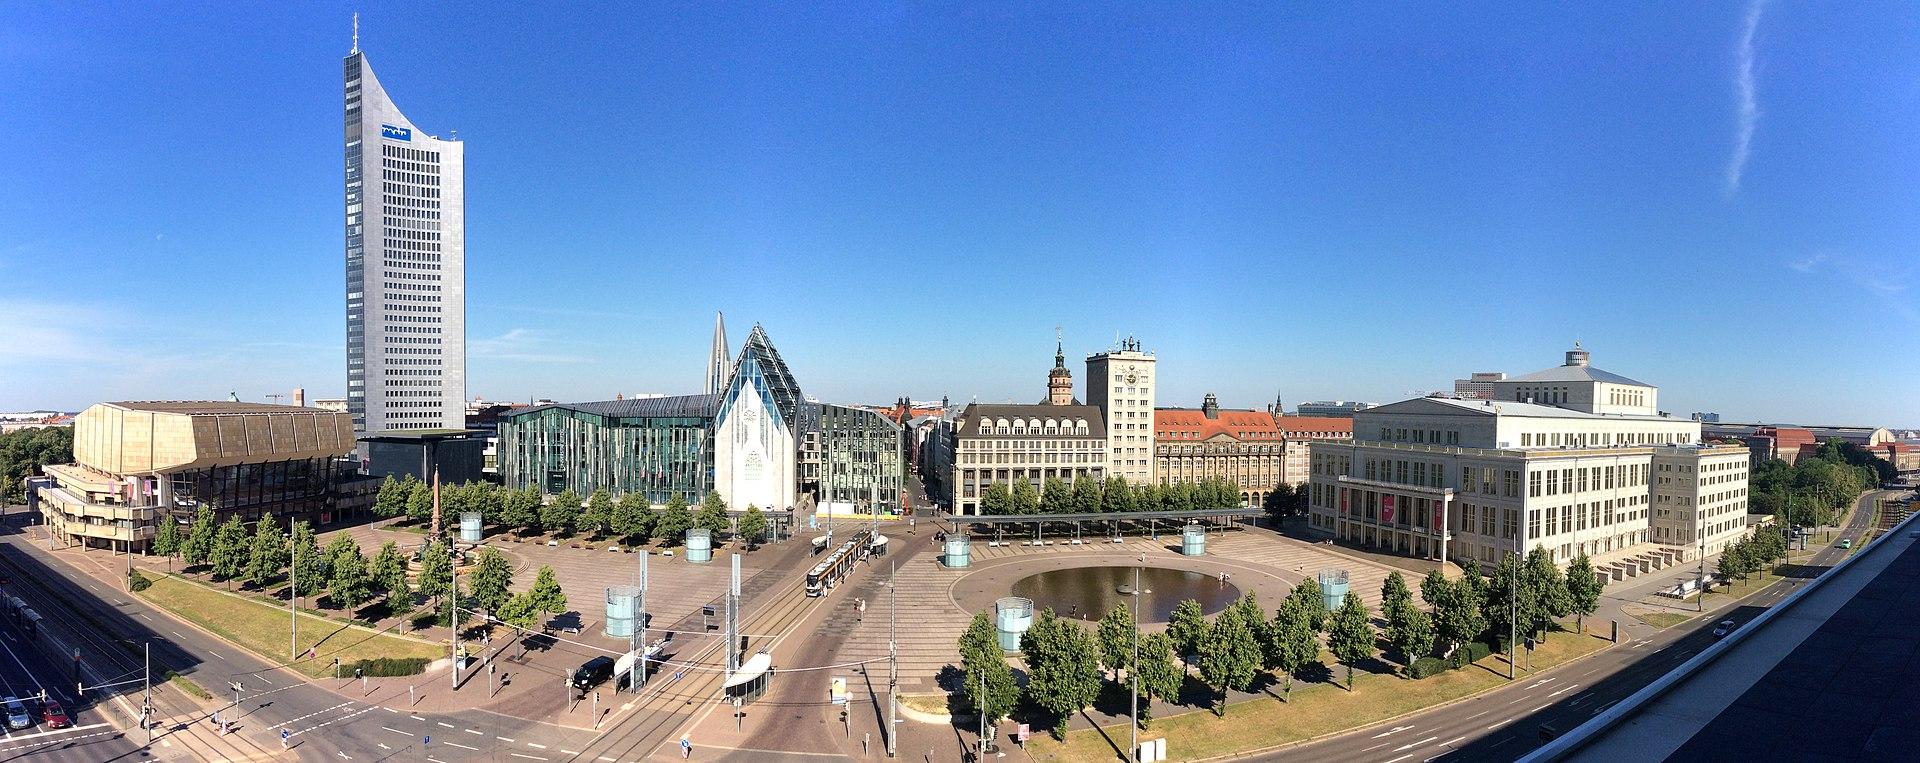 wikipedia-Augustplatz, 2019